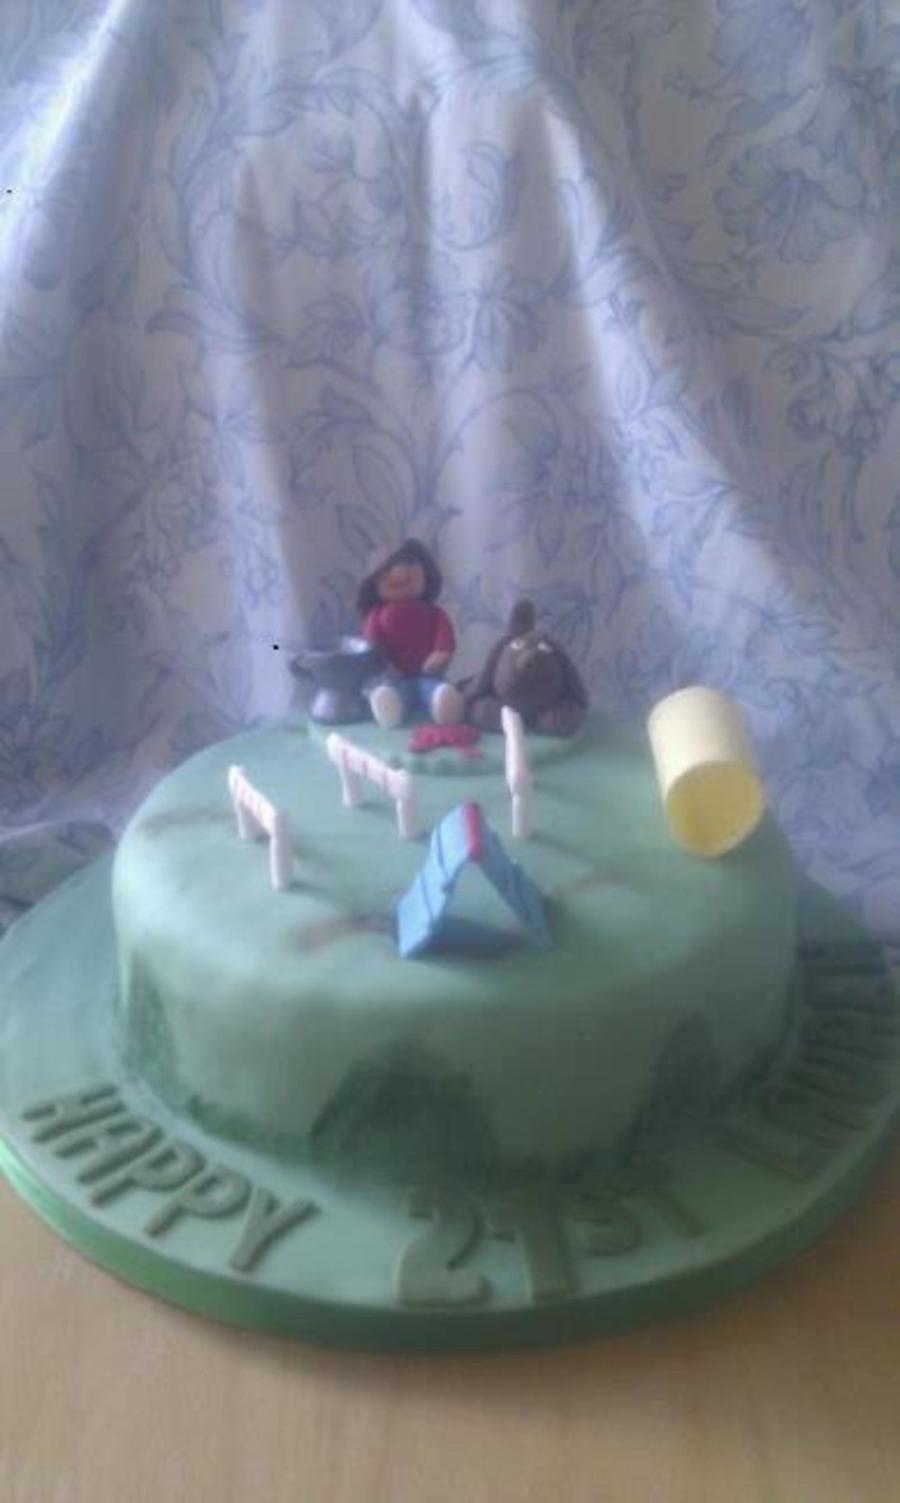 Dog Agility Cake Decorations : Dog Agility 21St Birthday Cake - CakeCentral.com